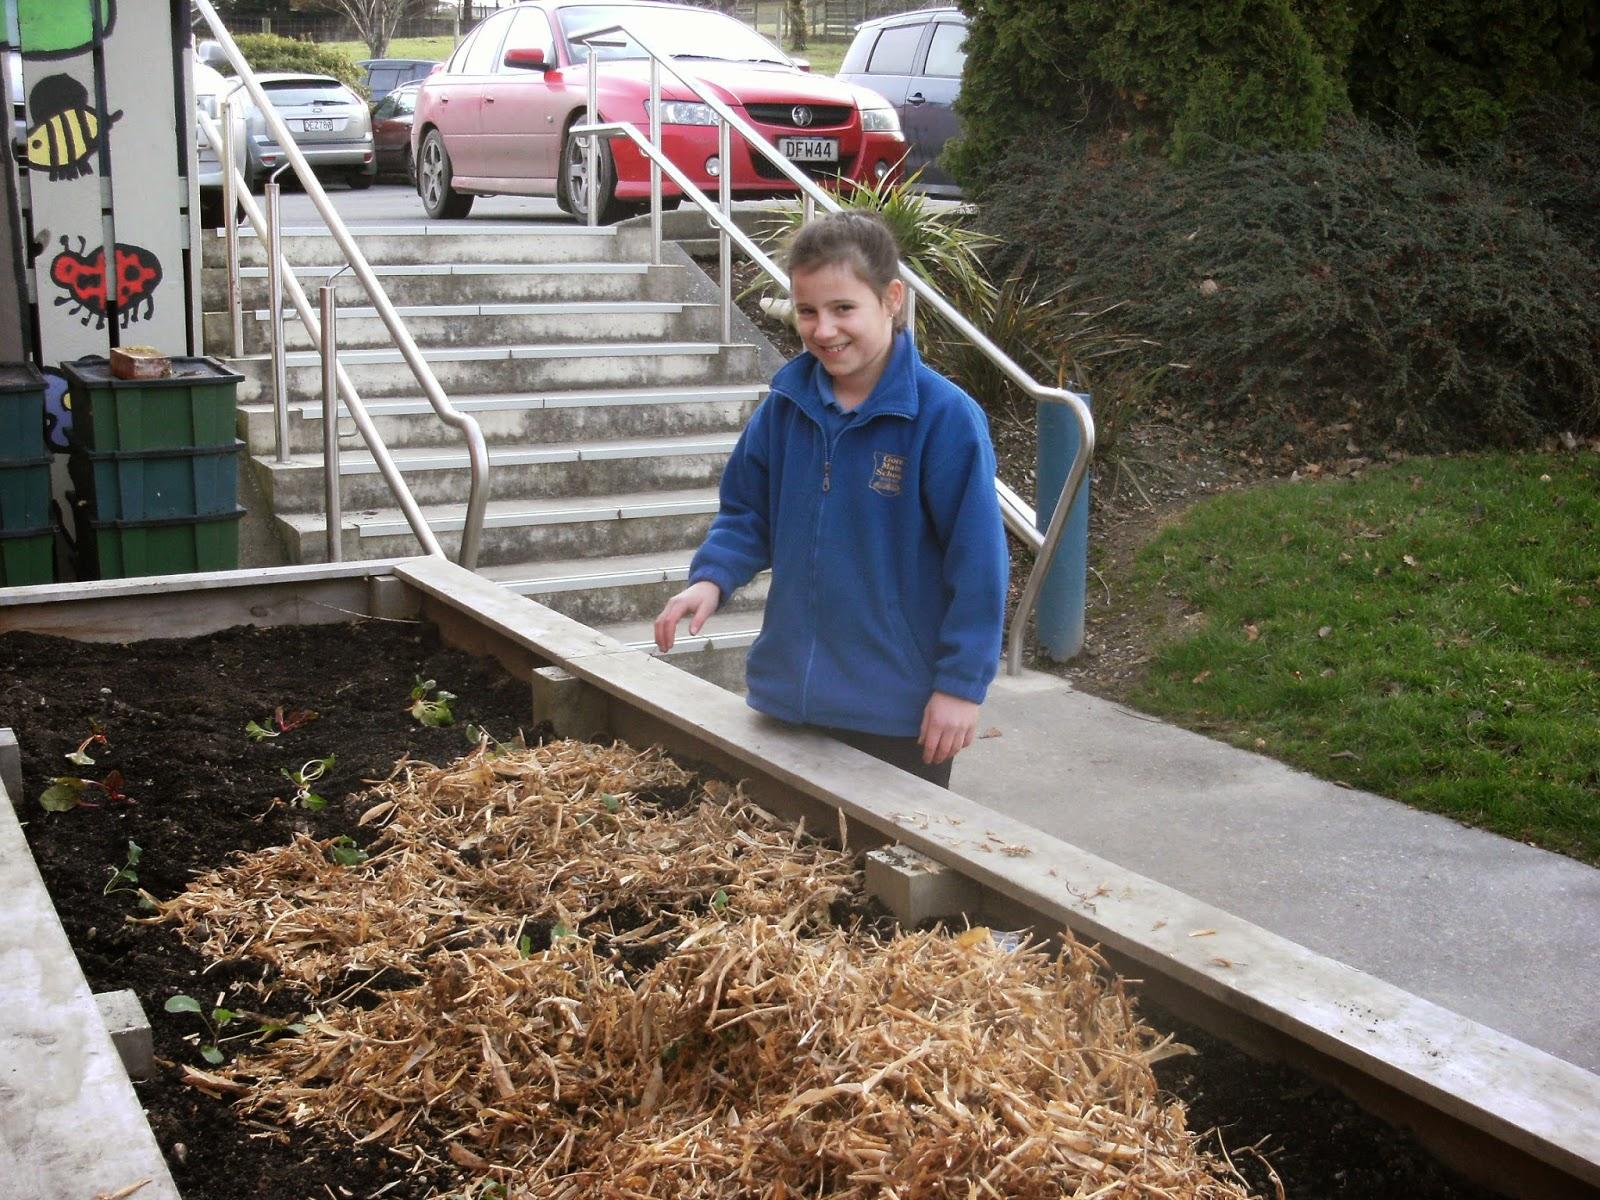 enviro group gore main preparing the garden for winter